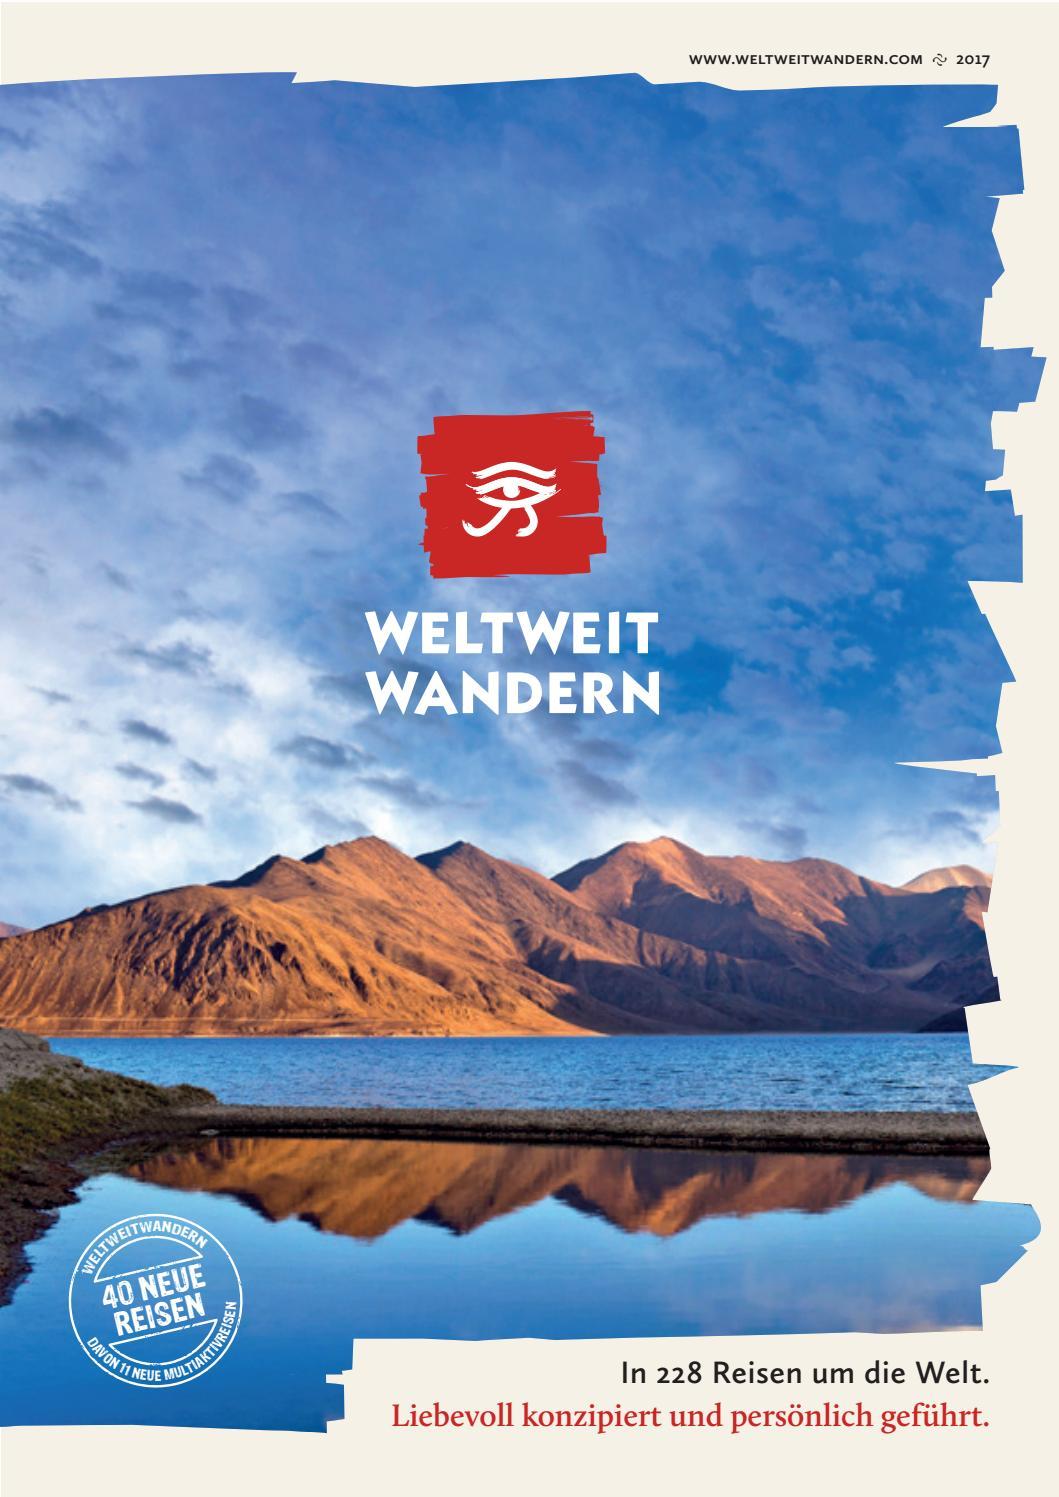 By Reisekatalog By Reisekatalog Weltweitwandern Issuu 2017 2017 Weltweitwandern Issuu Weltweitwandern 5AL34Rj